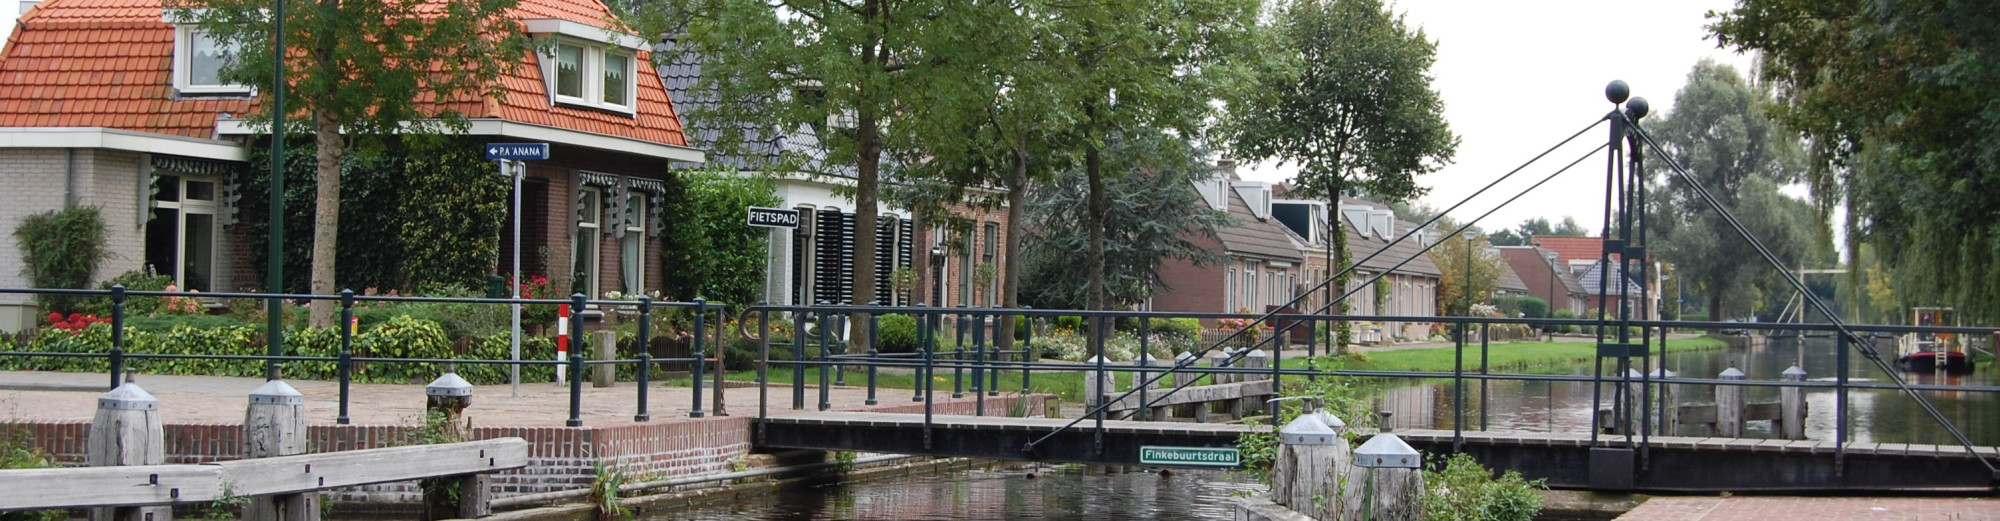 Woningvoorraad  Zuidoost Fryslân